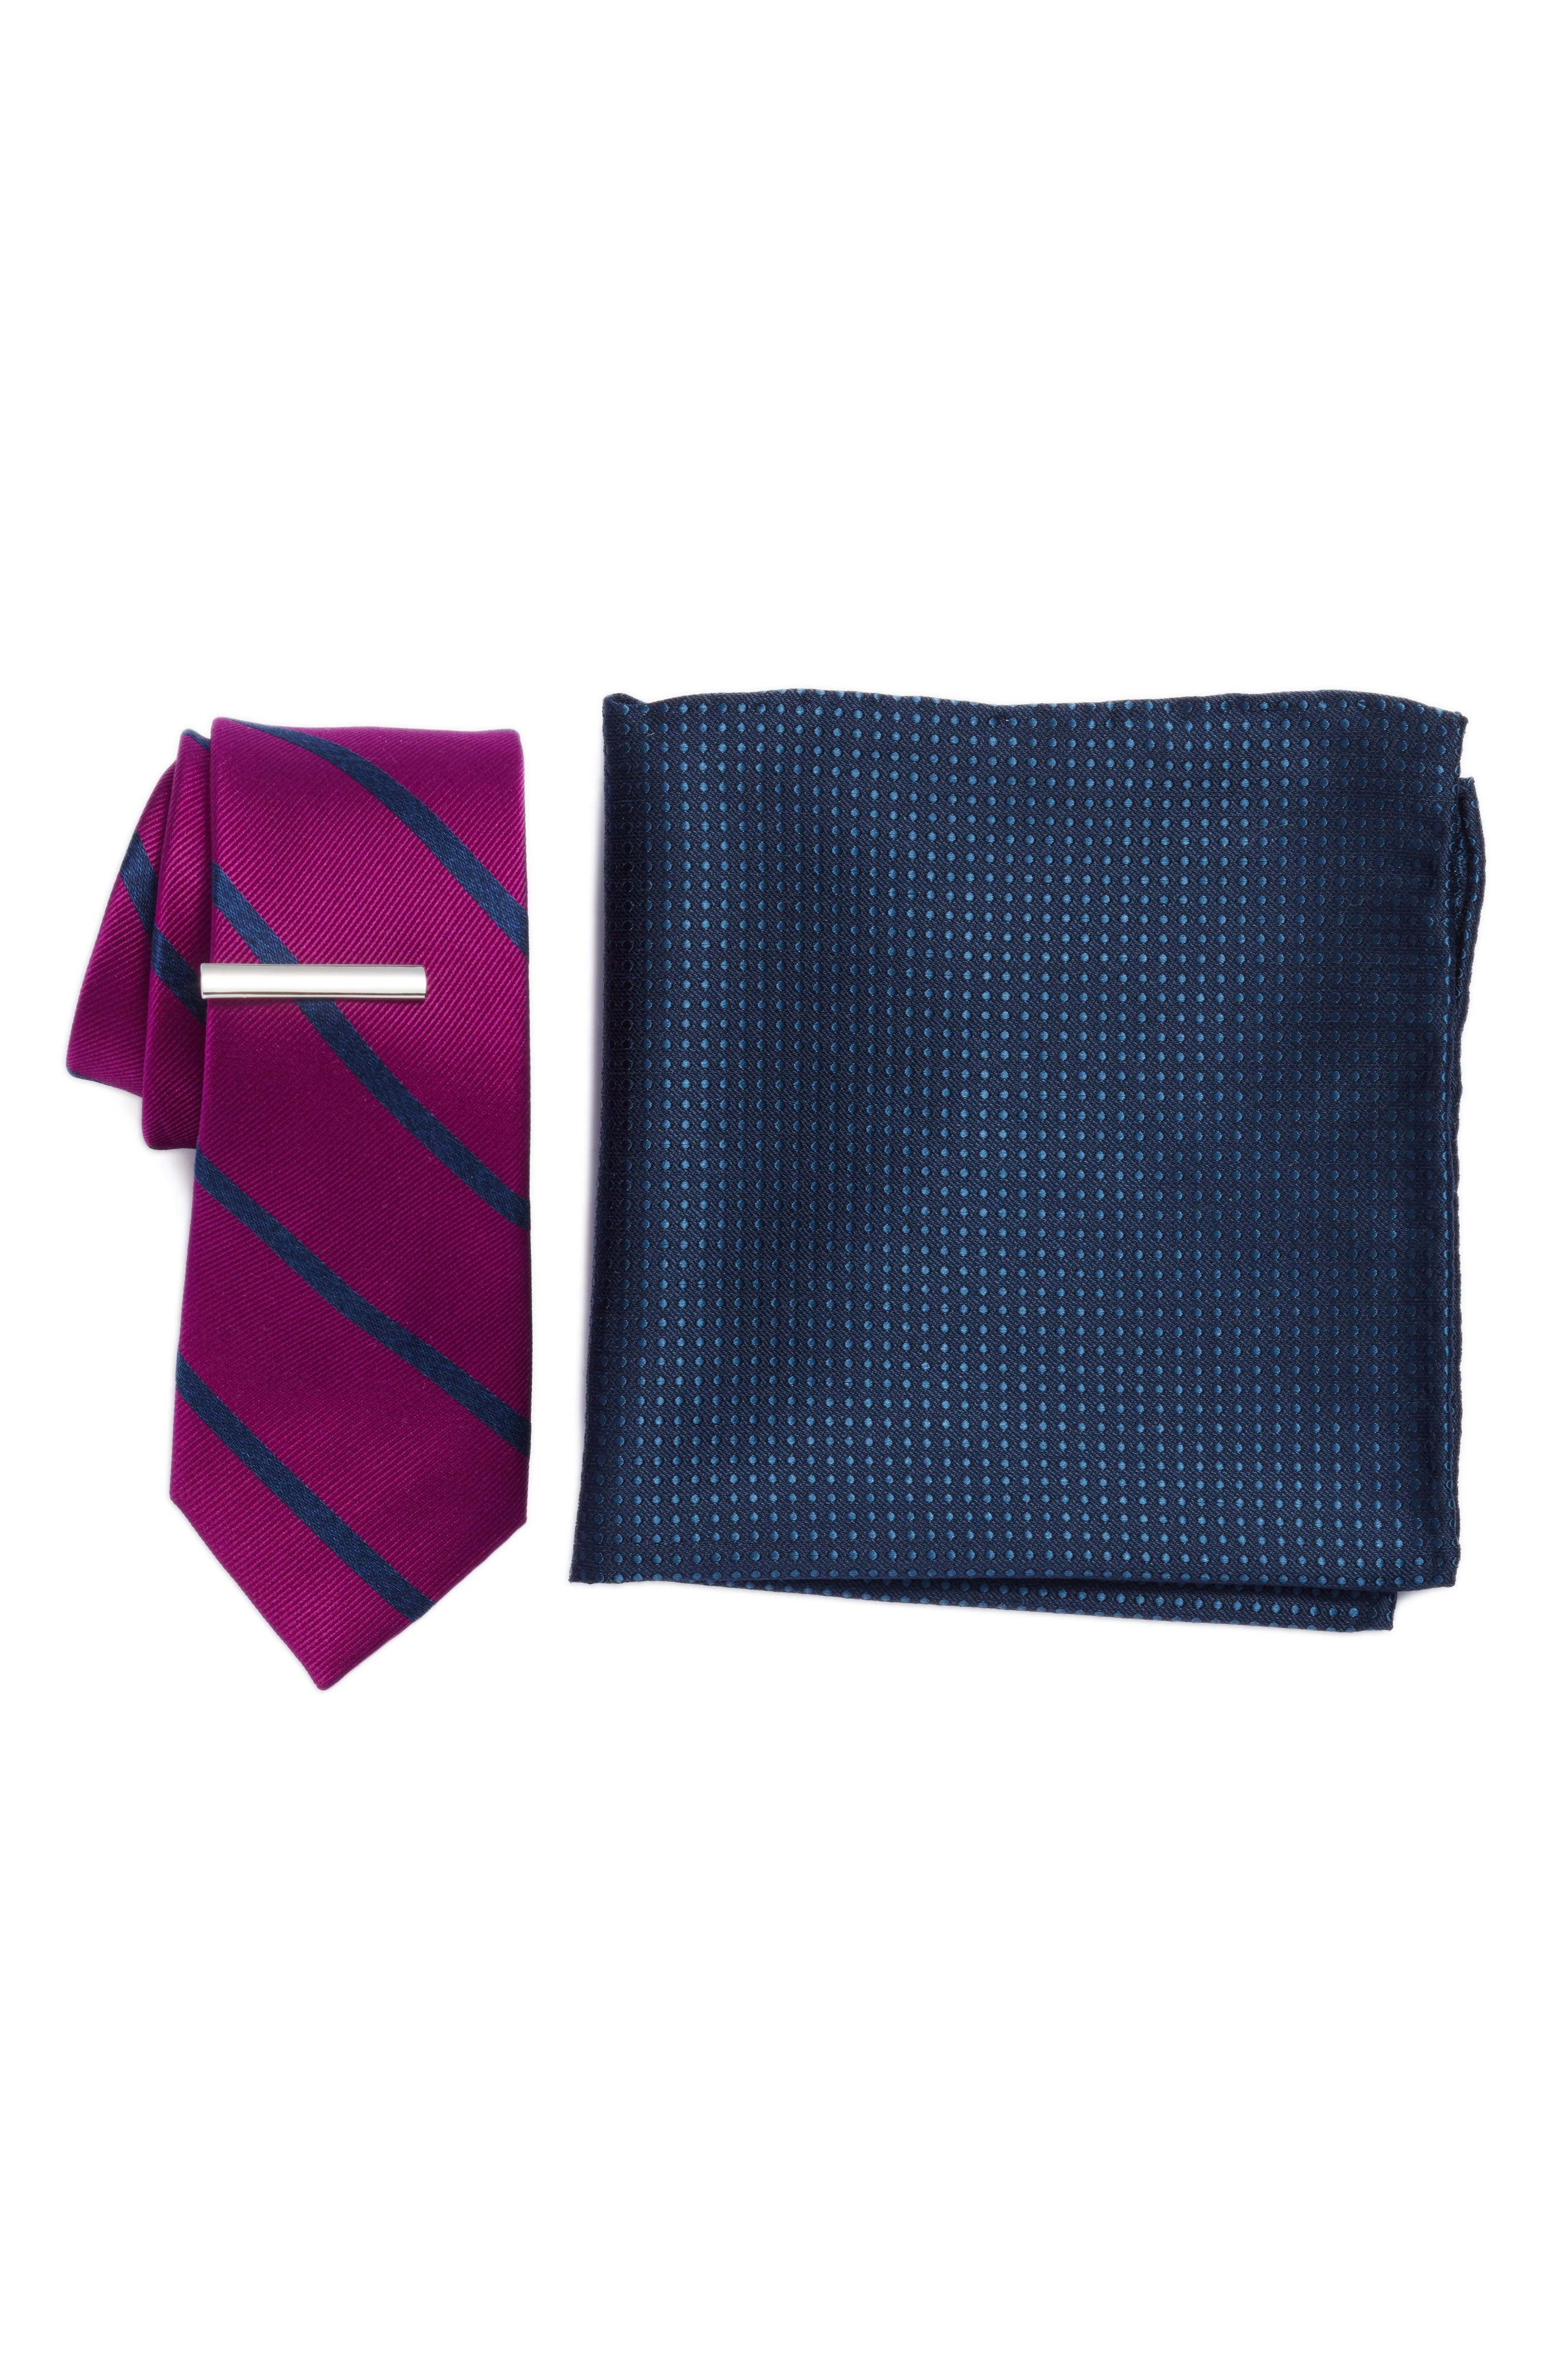 Wheelhouse Stripe 3-Piece Skinny Tie Style Box,                         Main,                         color, Azalea